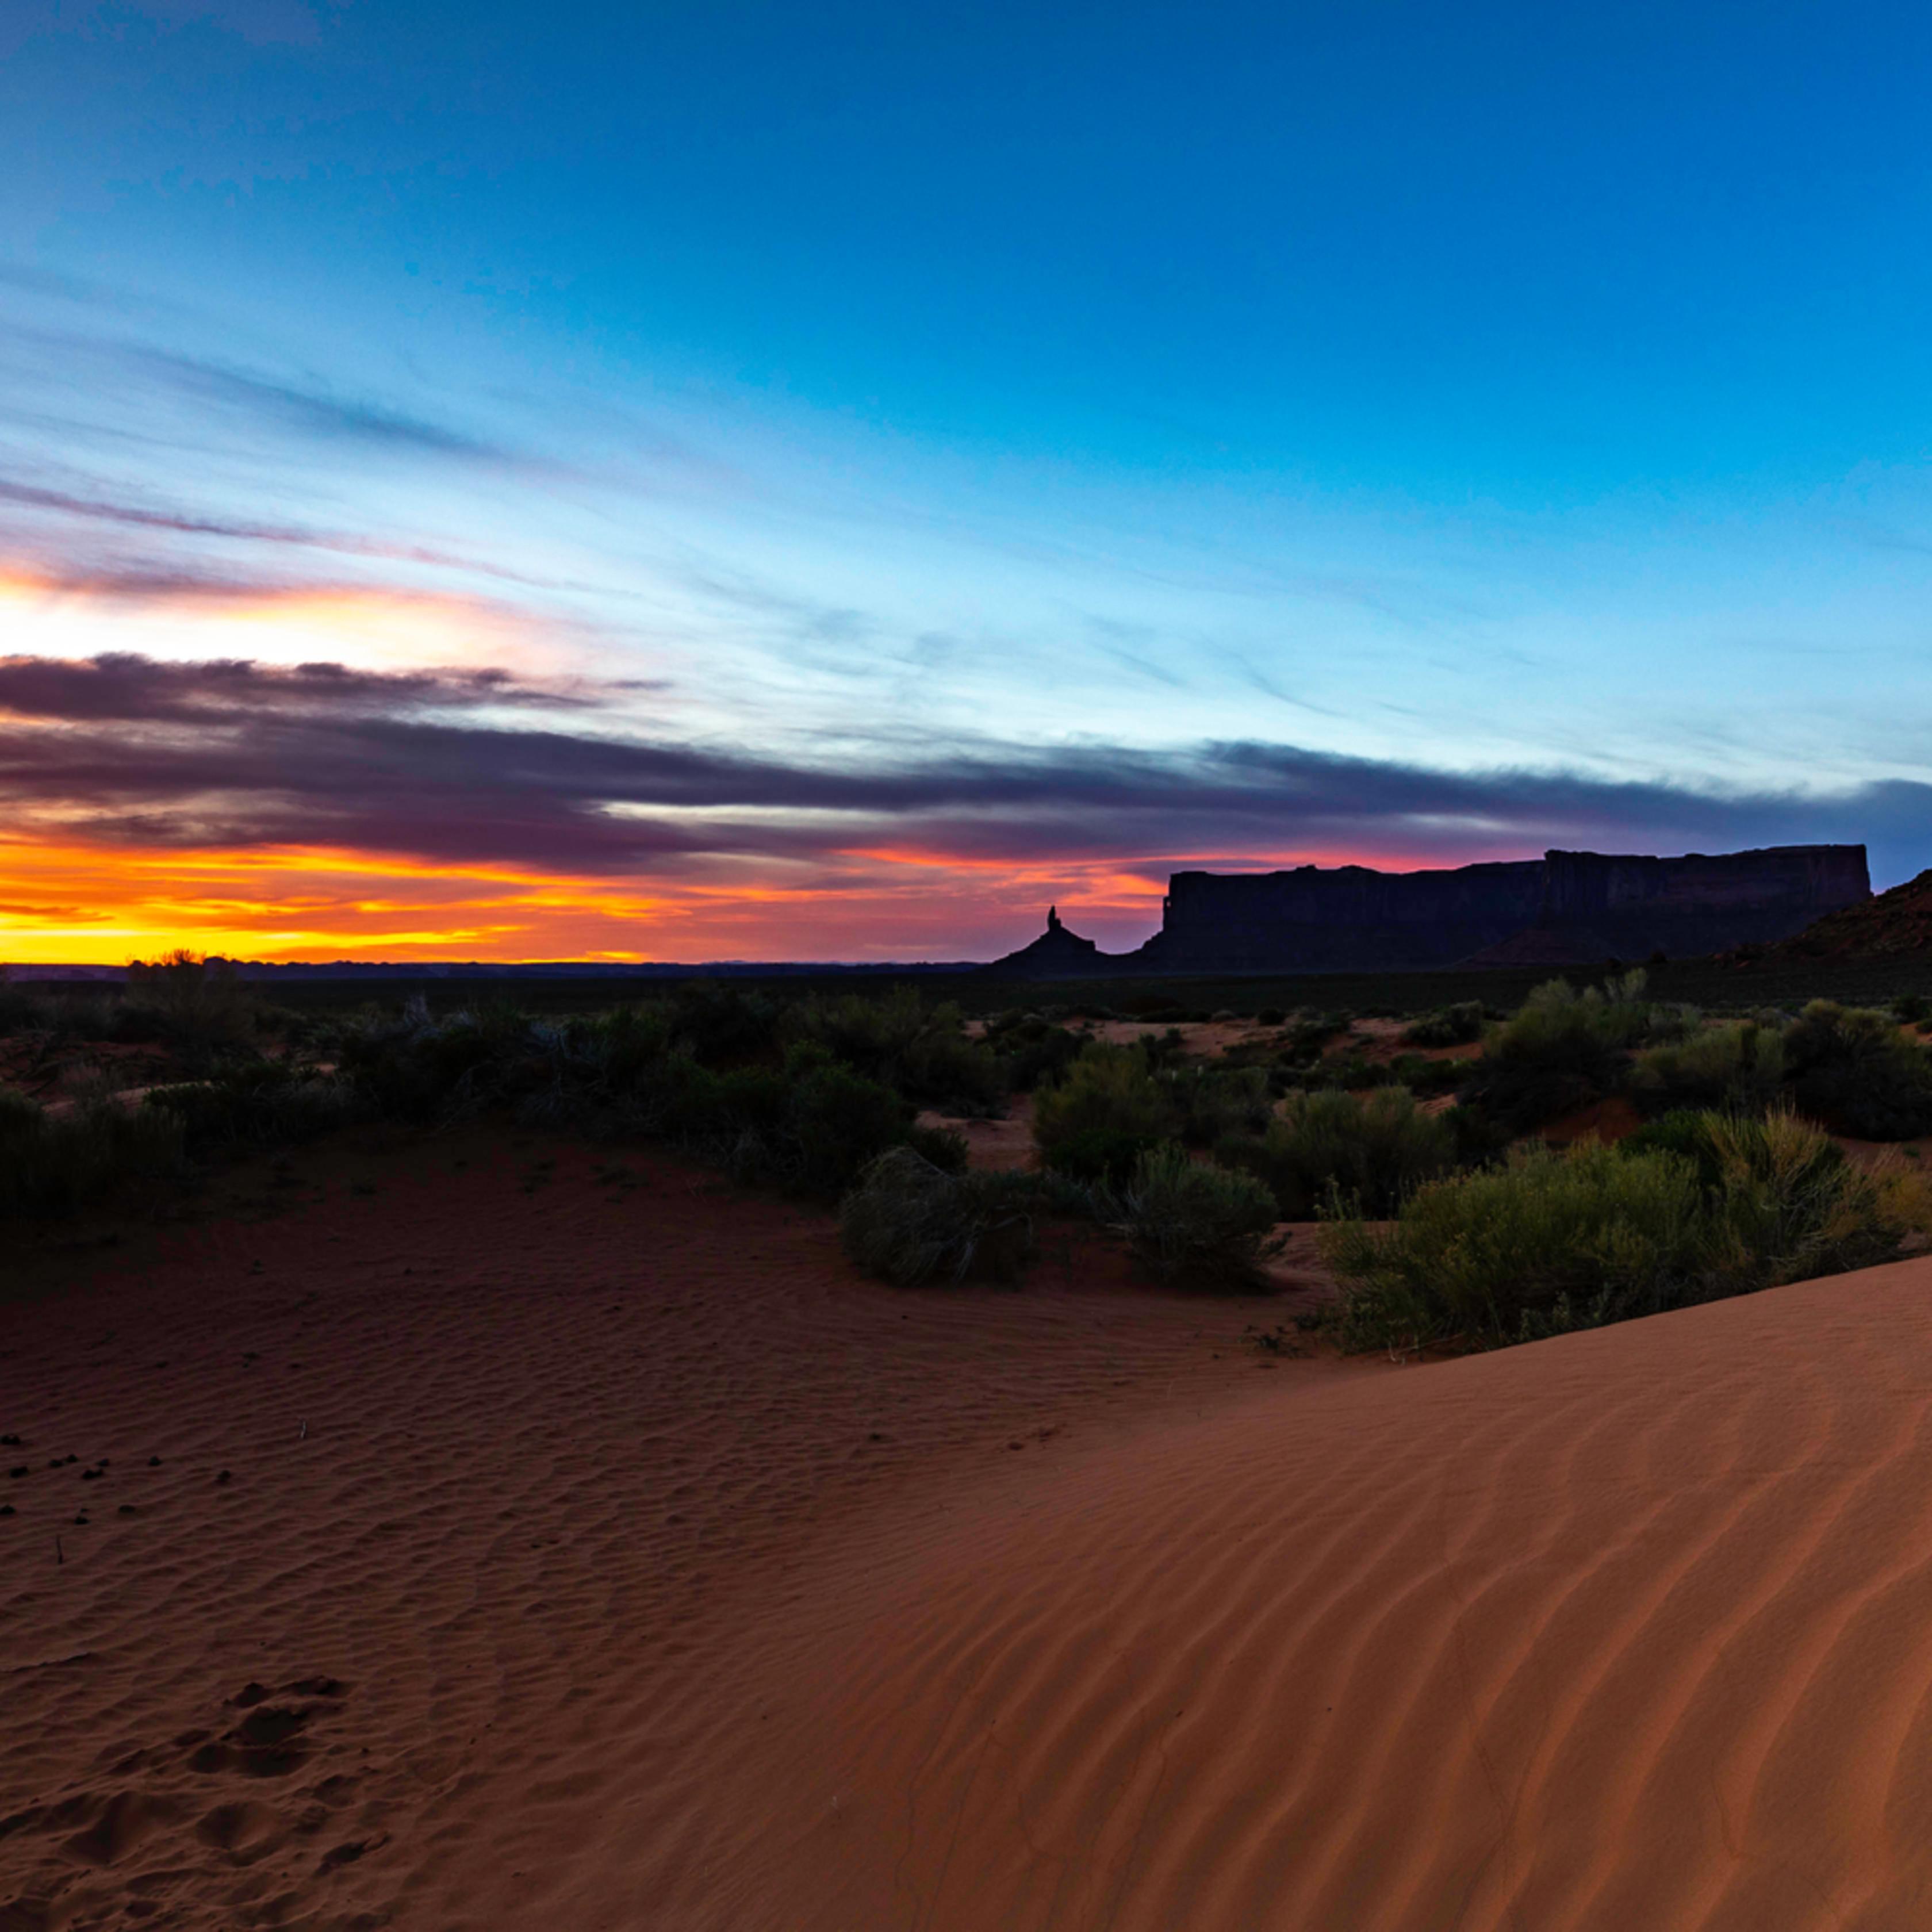 Sunrise on the sands of time zaqsem